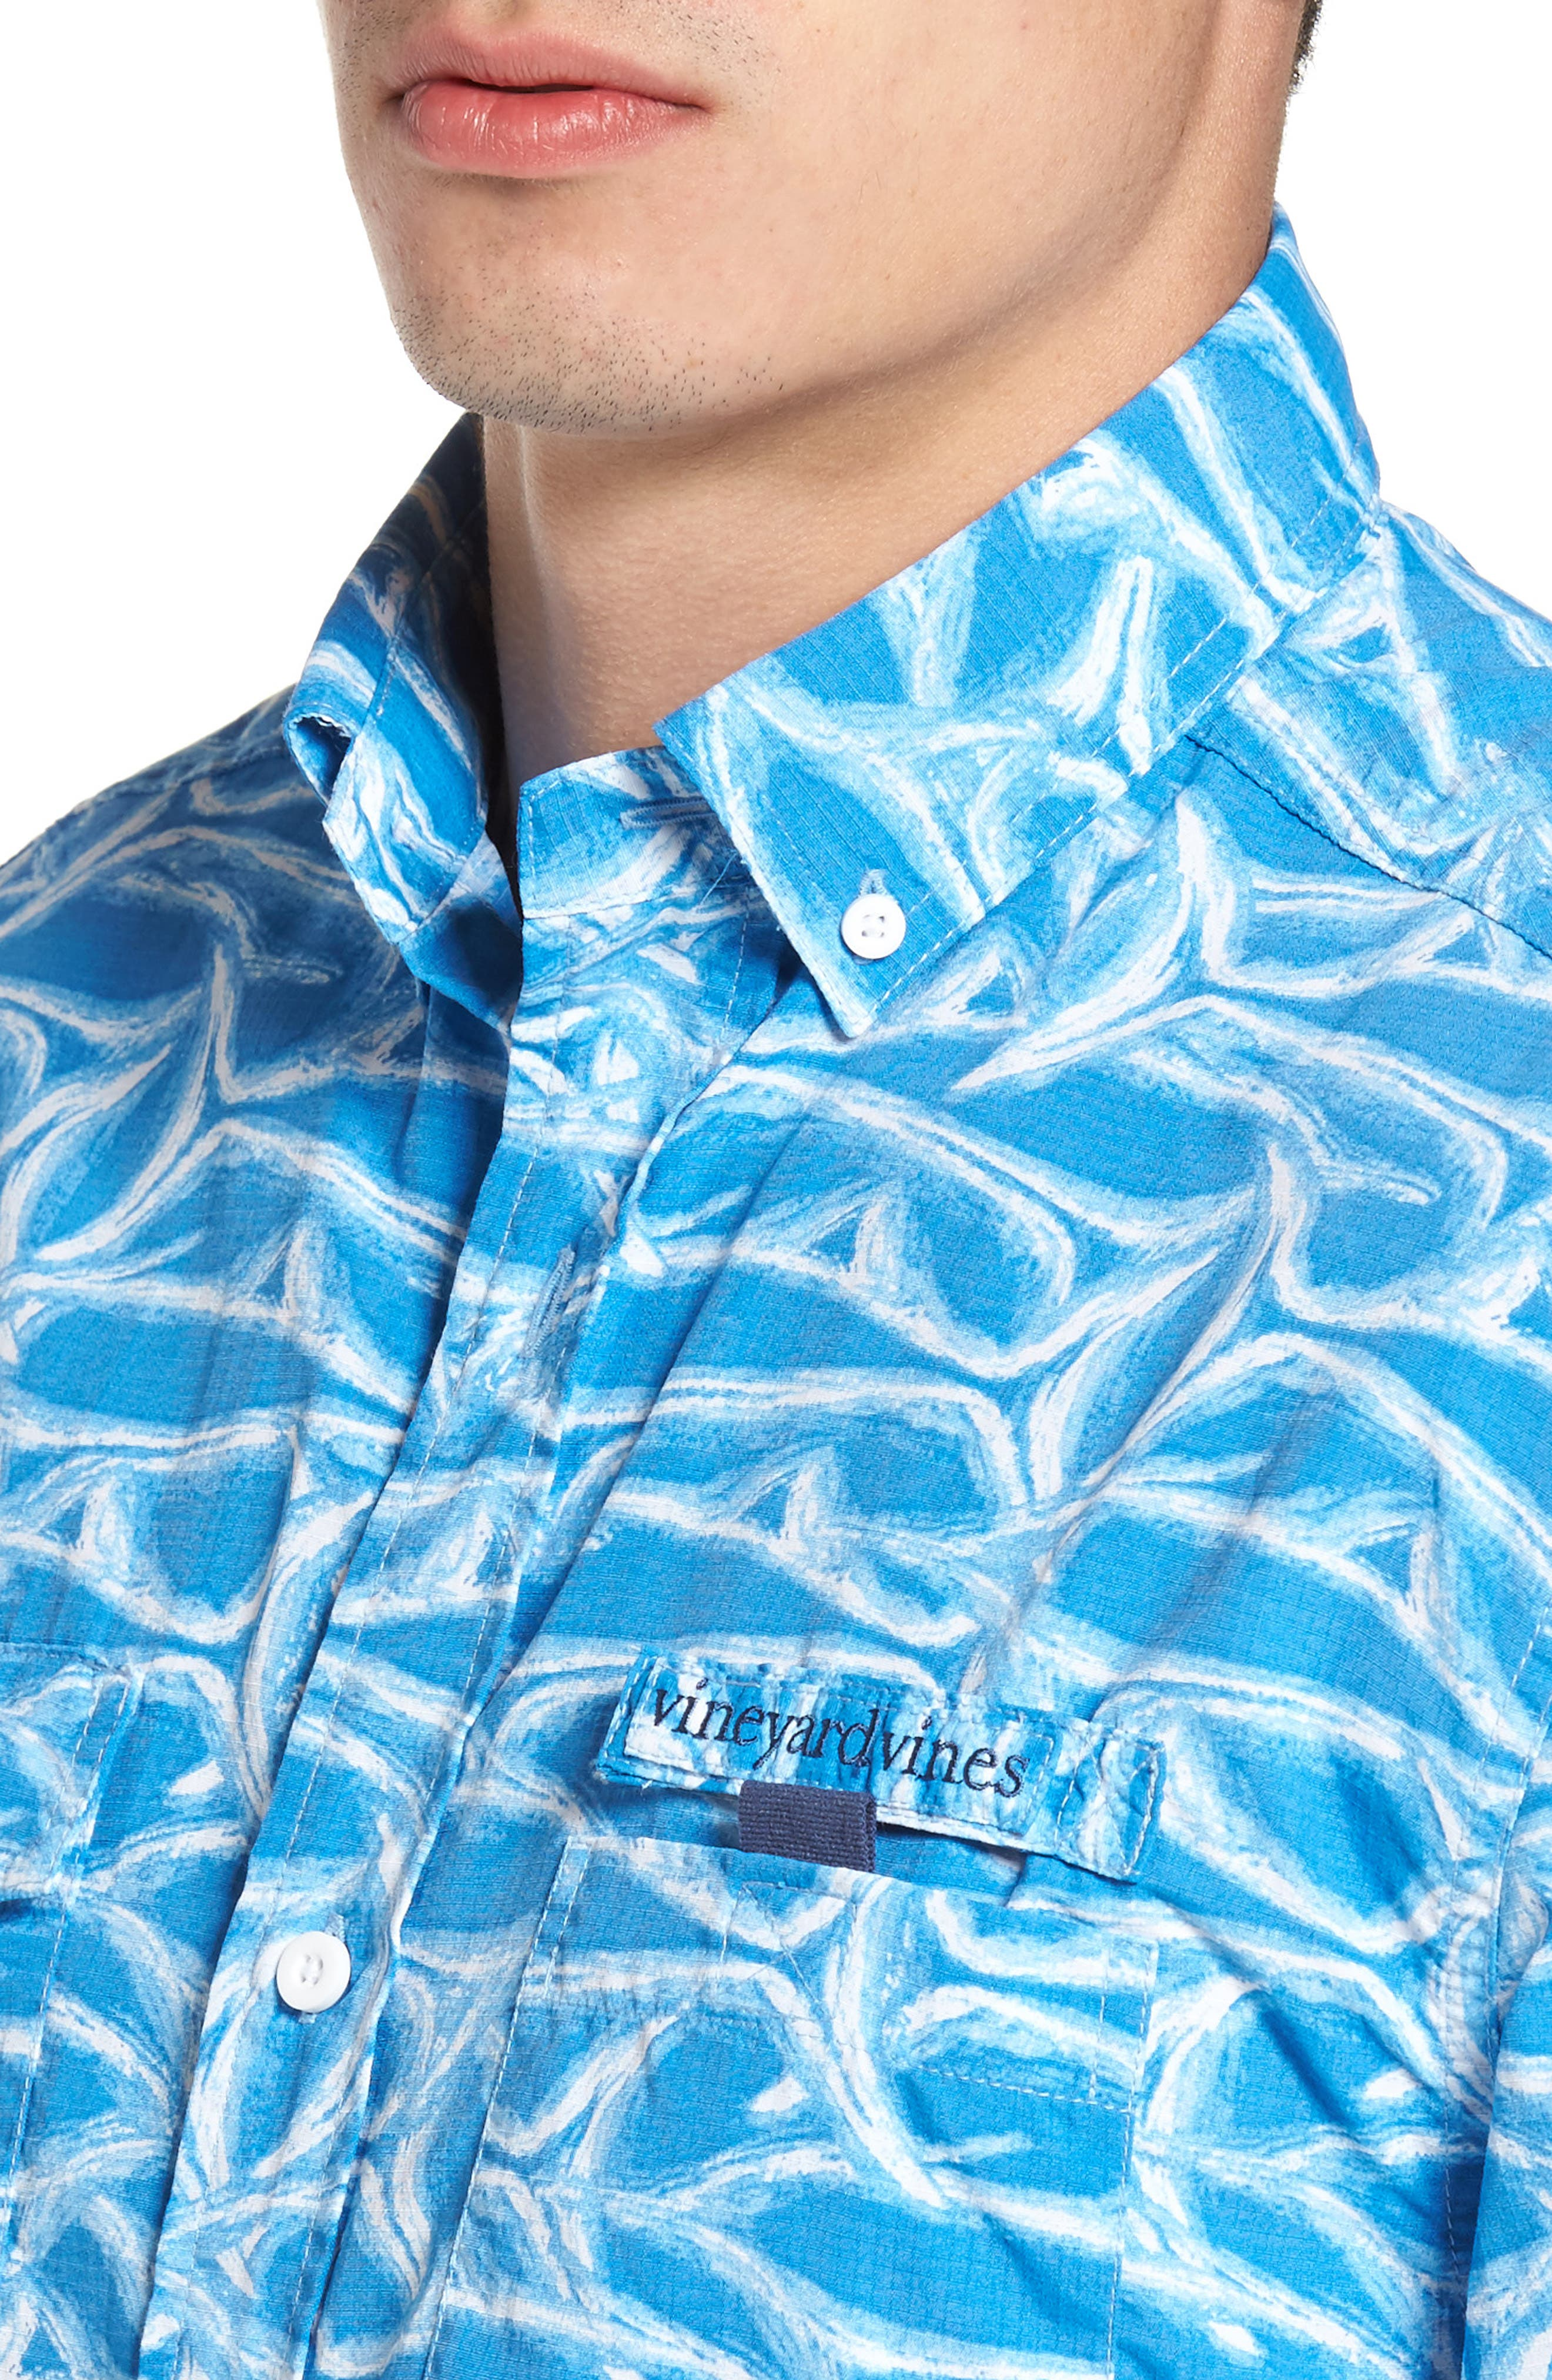 Harbor Brushed Marlin Fishing Shirt,                             Alternate thumbnail 4, color,                             496